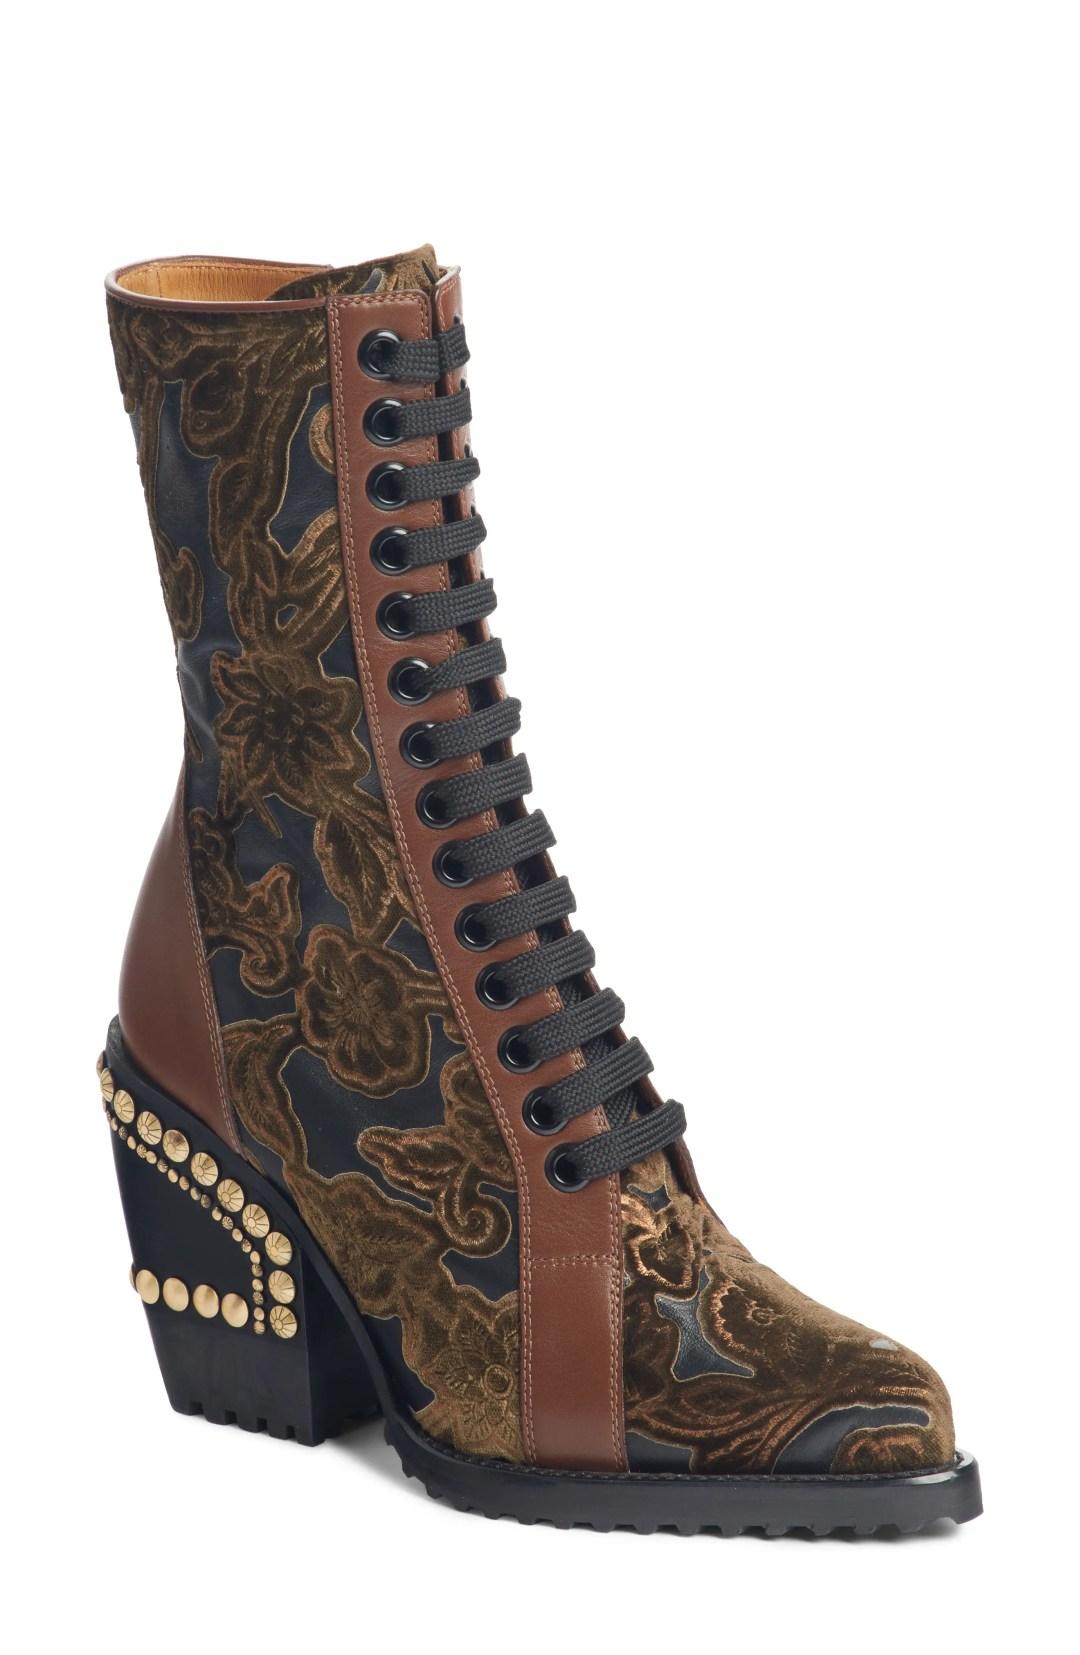 6167b0f7e23a Chloé Medium Nile Leather Bracelet Saddle Bag